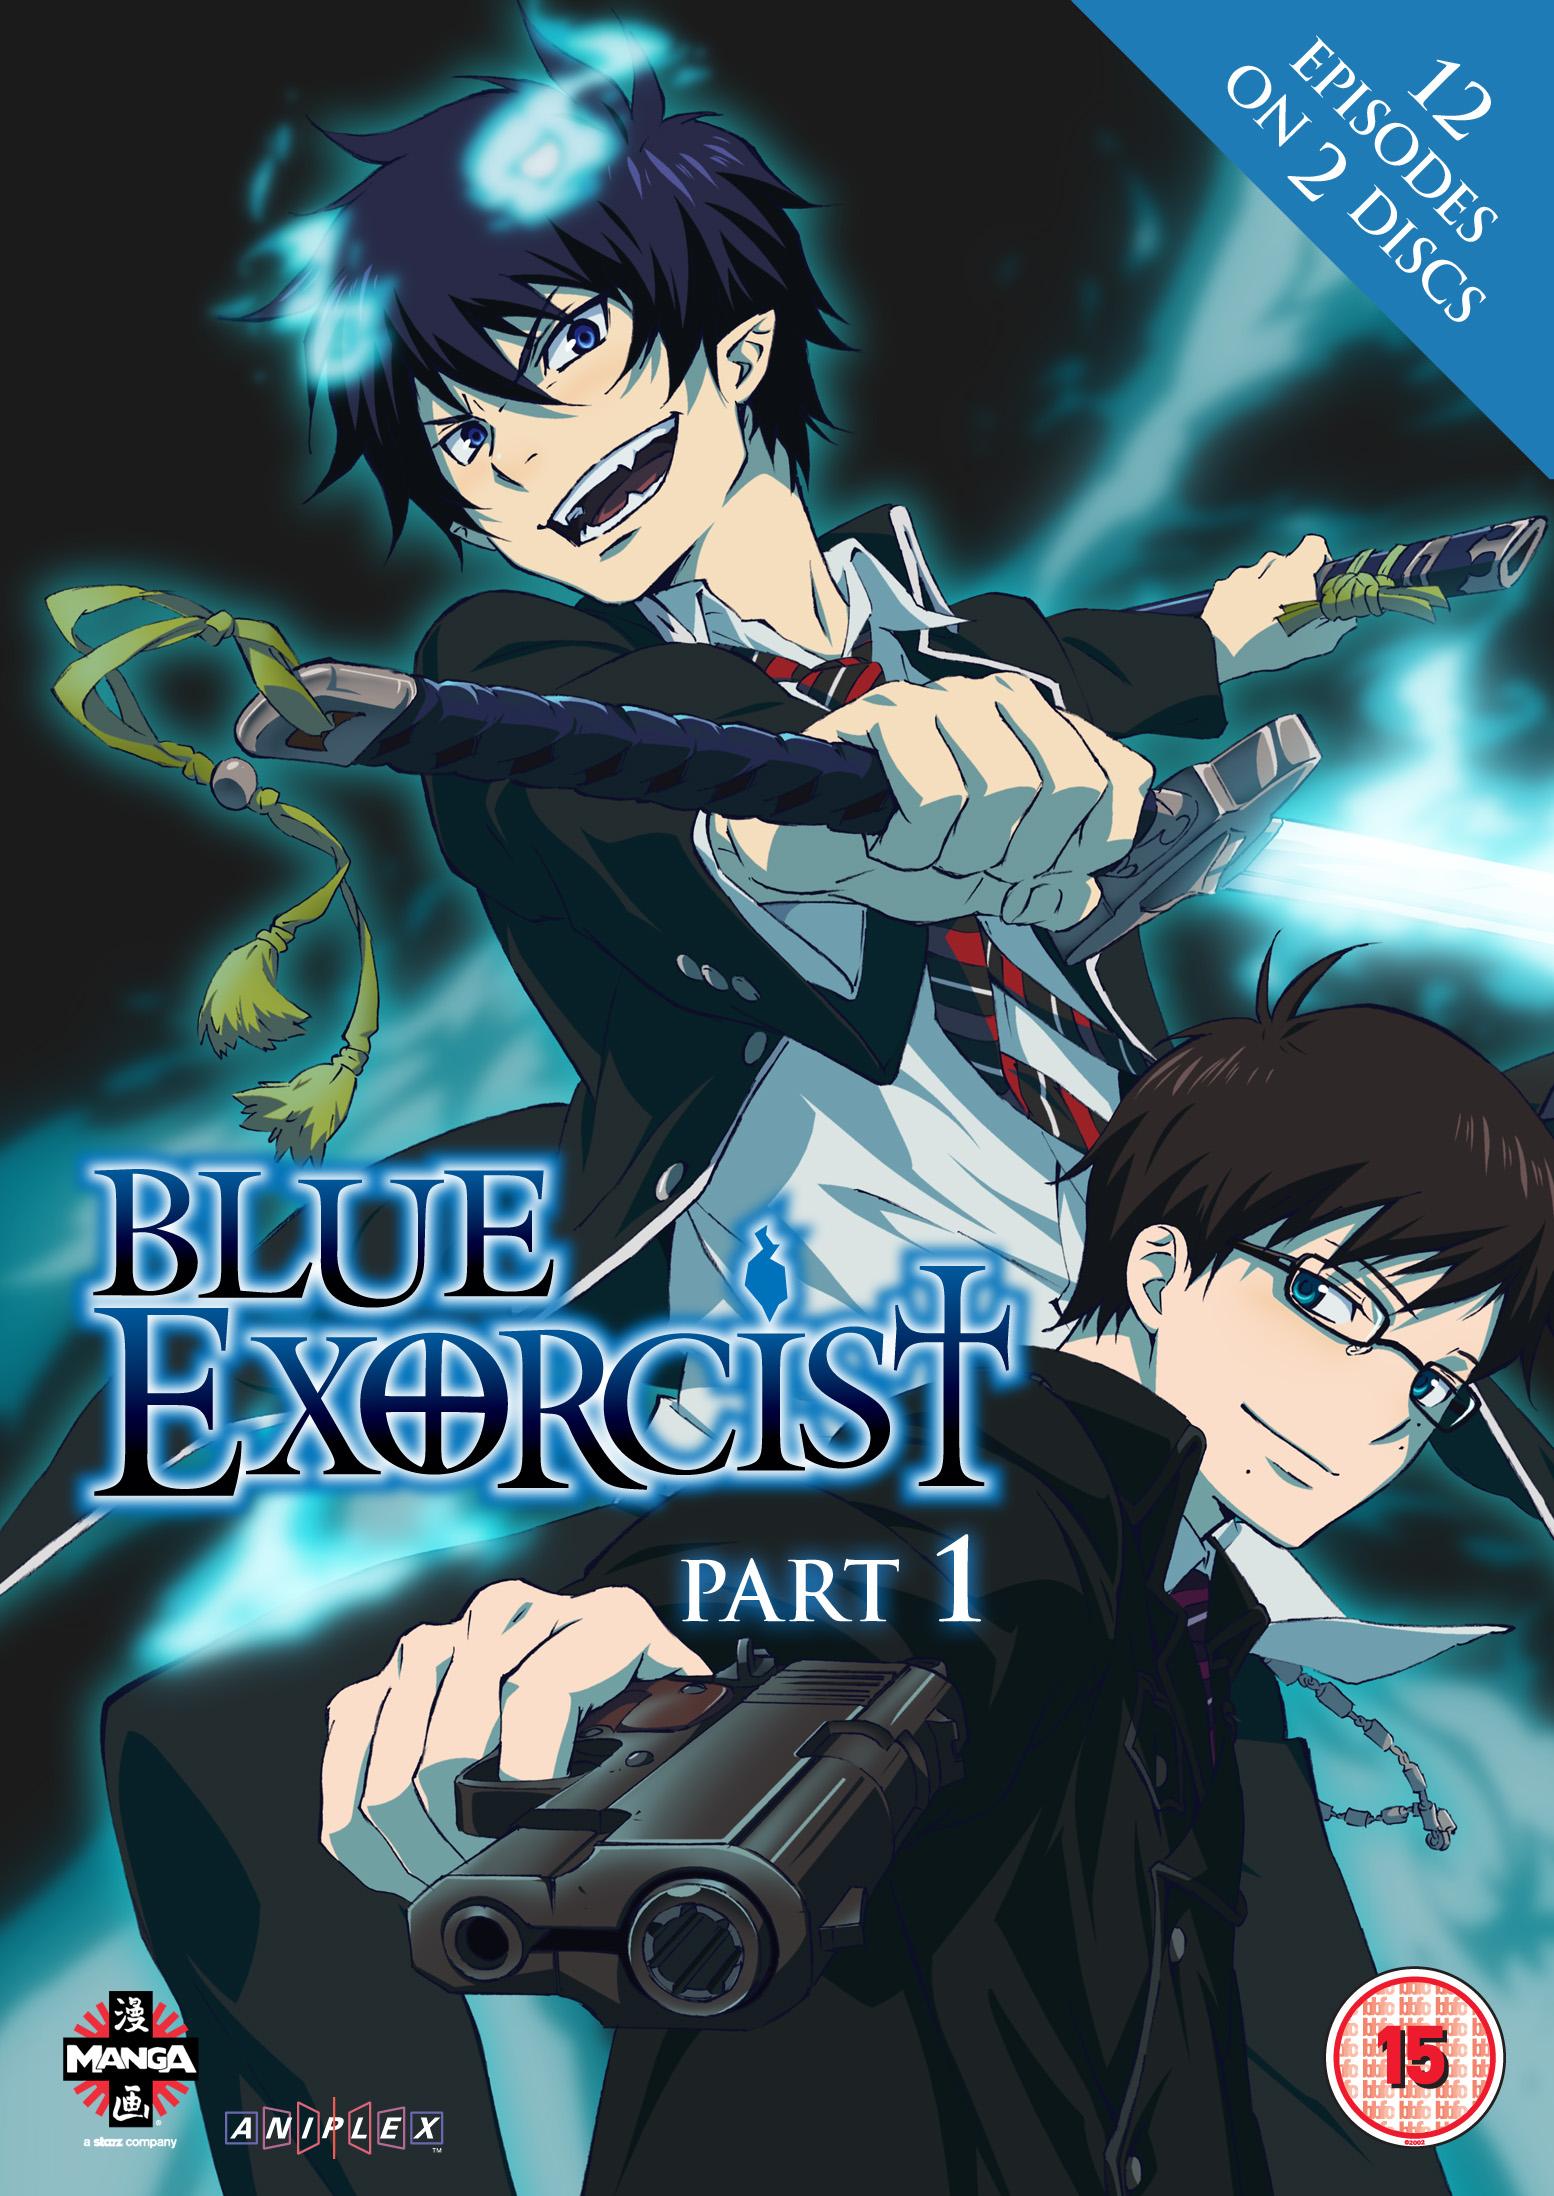 Demon bloodlines: A review of Blue Exorcist part 1